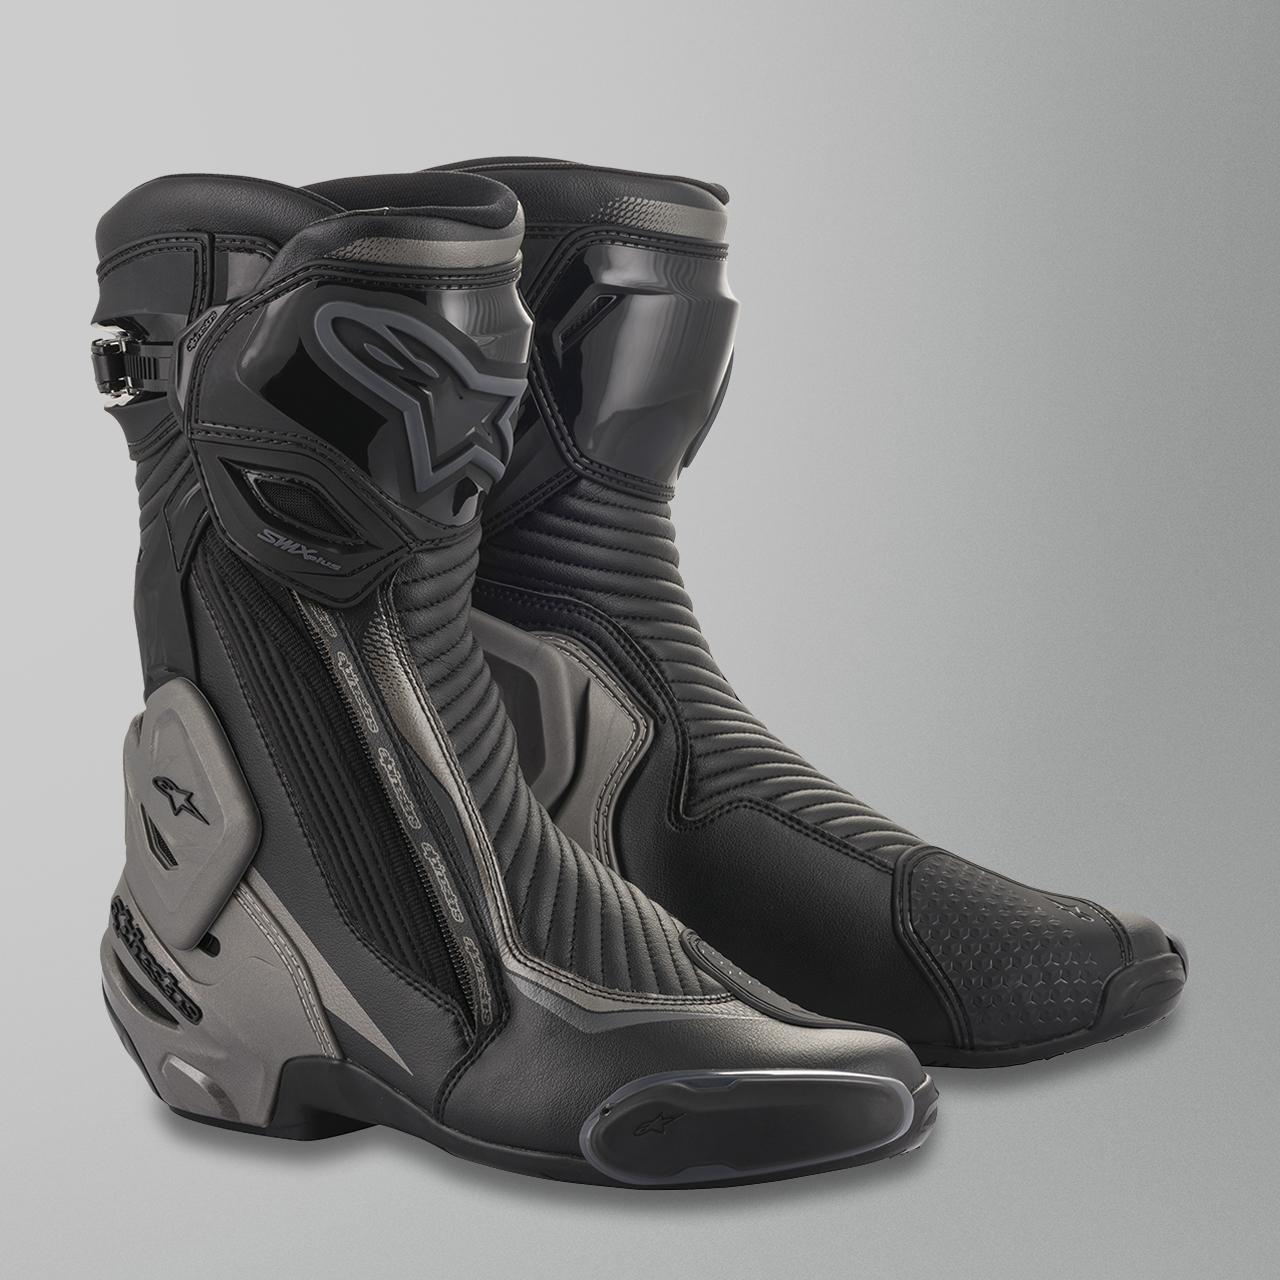 Alpinestars SMX Plus V2 MC Boots Black